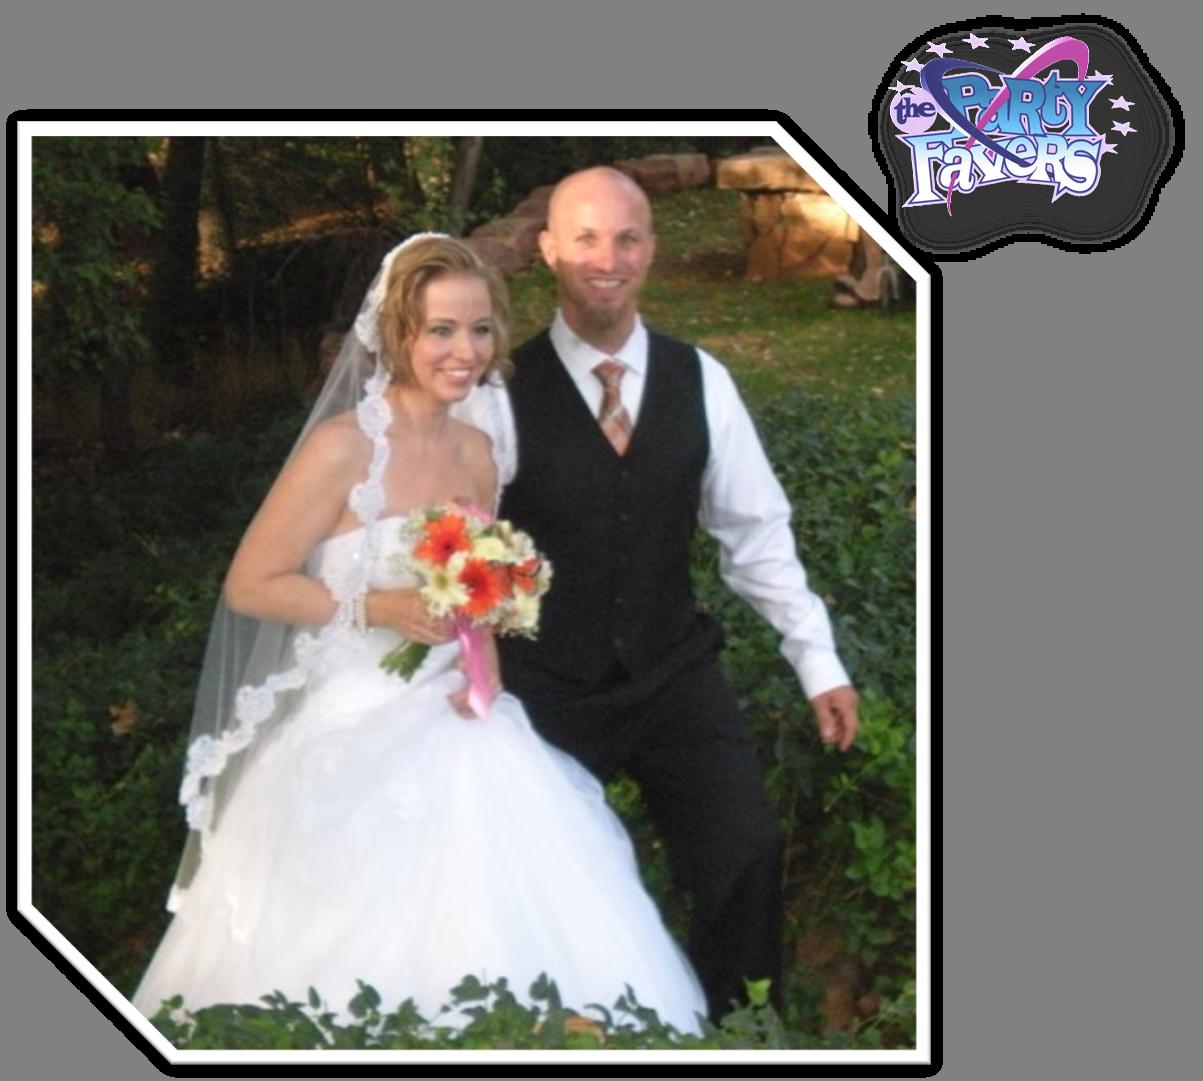 Bride And Groom Trivia: Bride And Groom Trivia